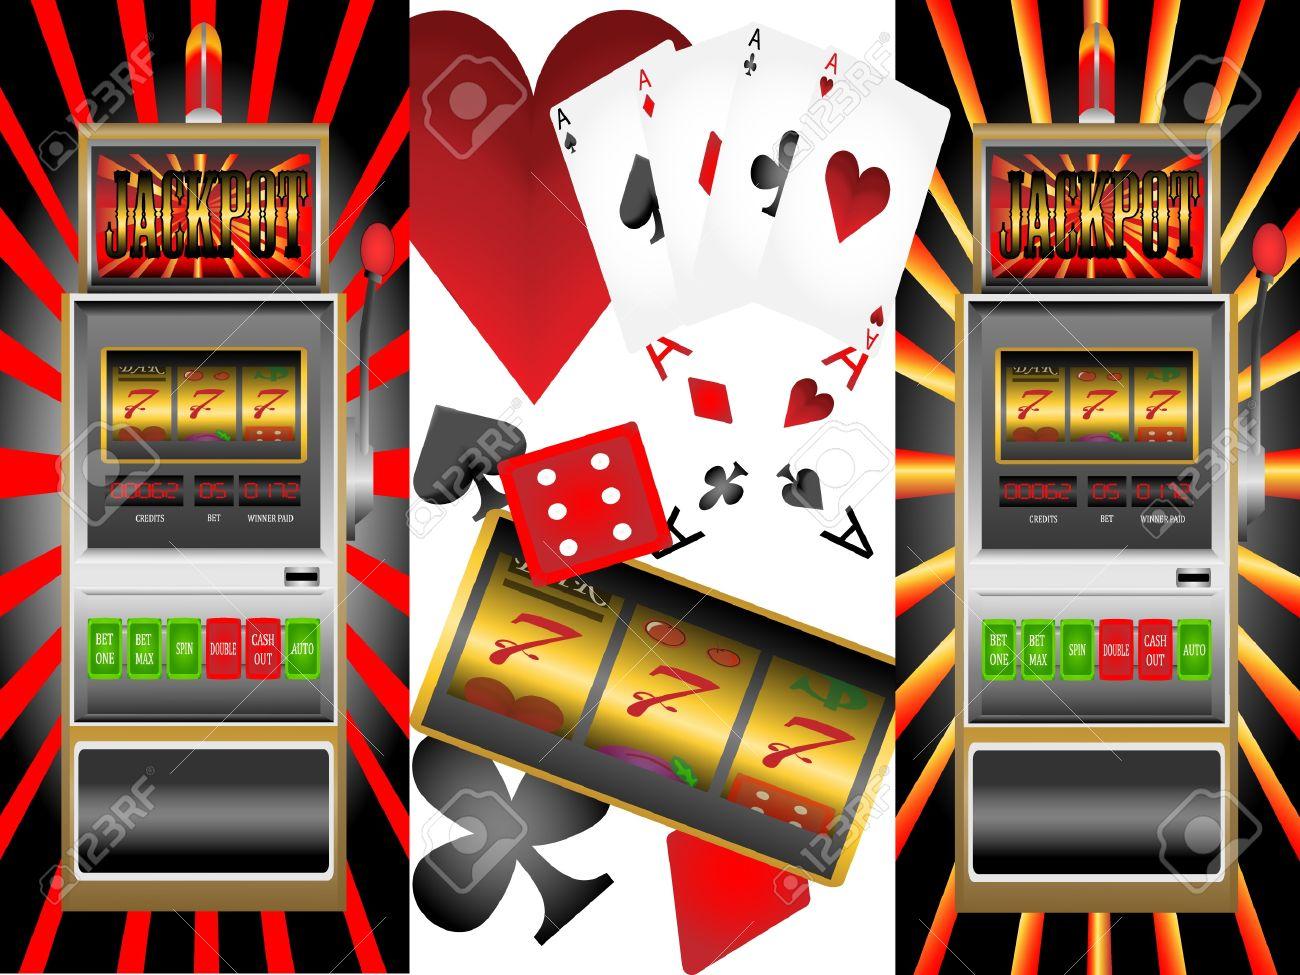 Play poker slot machine free i was born a gambling